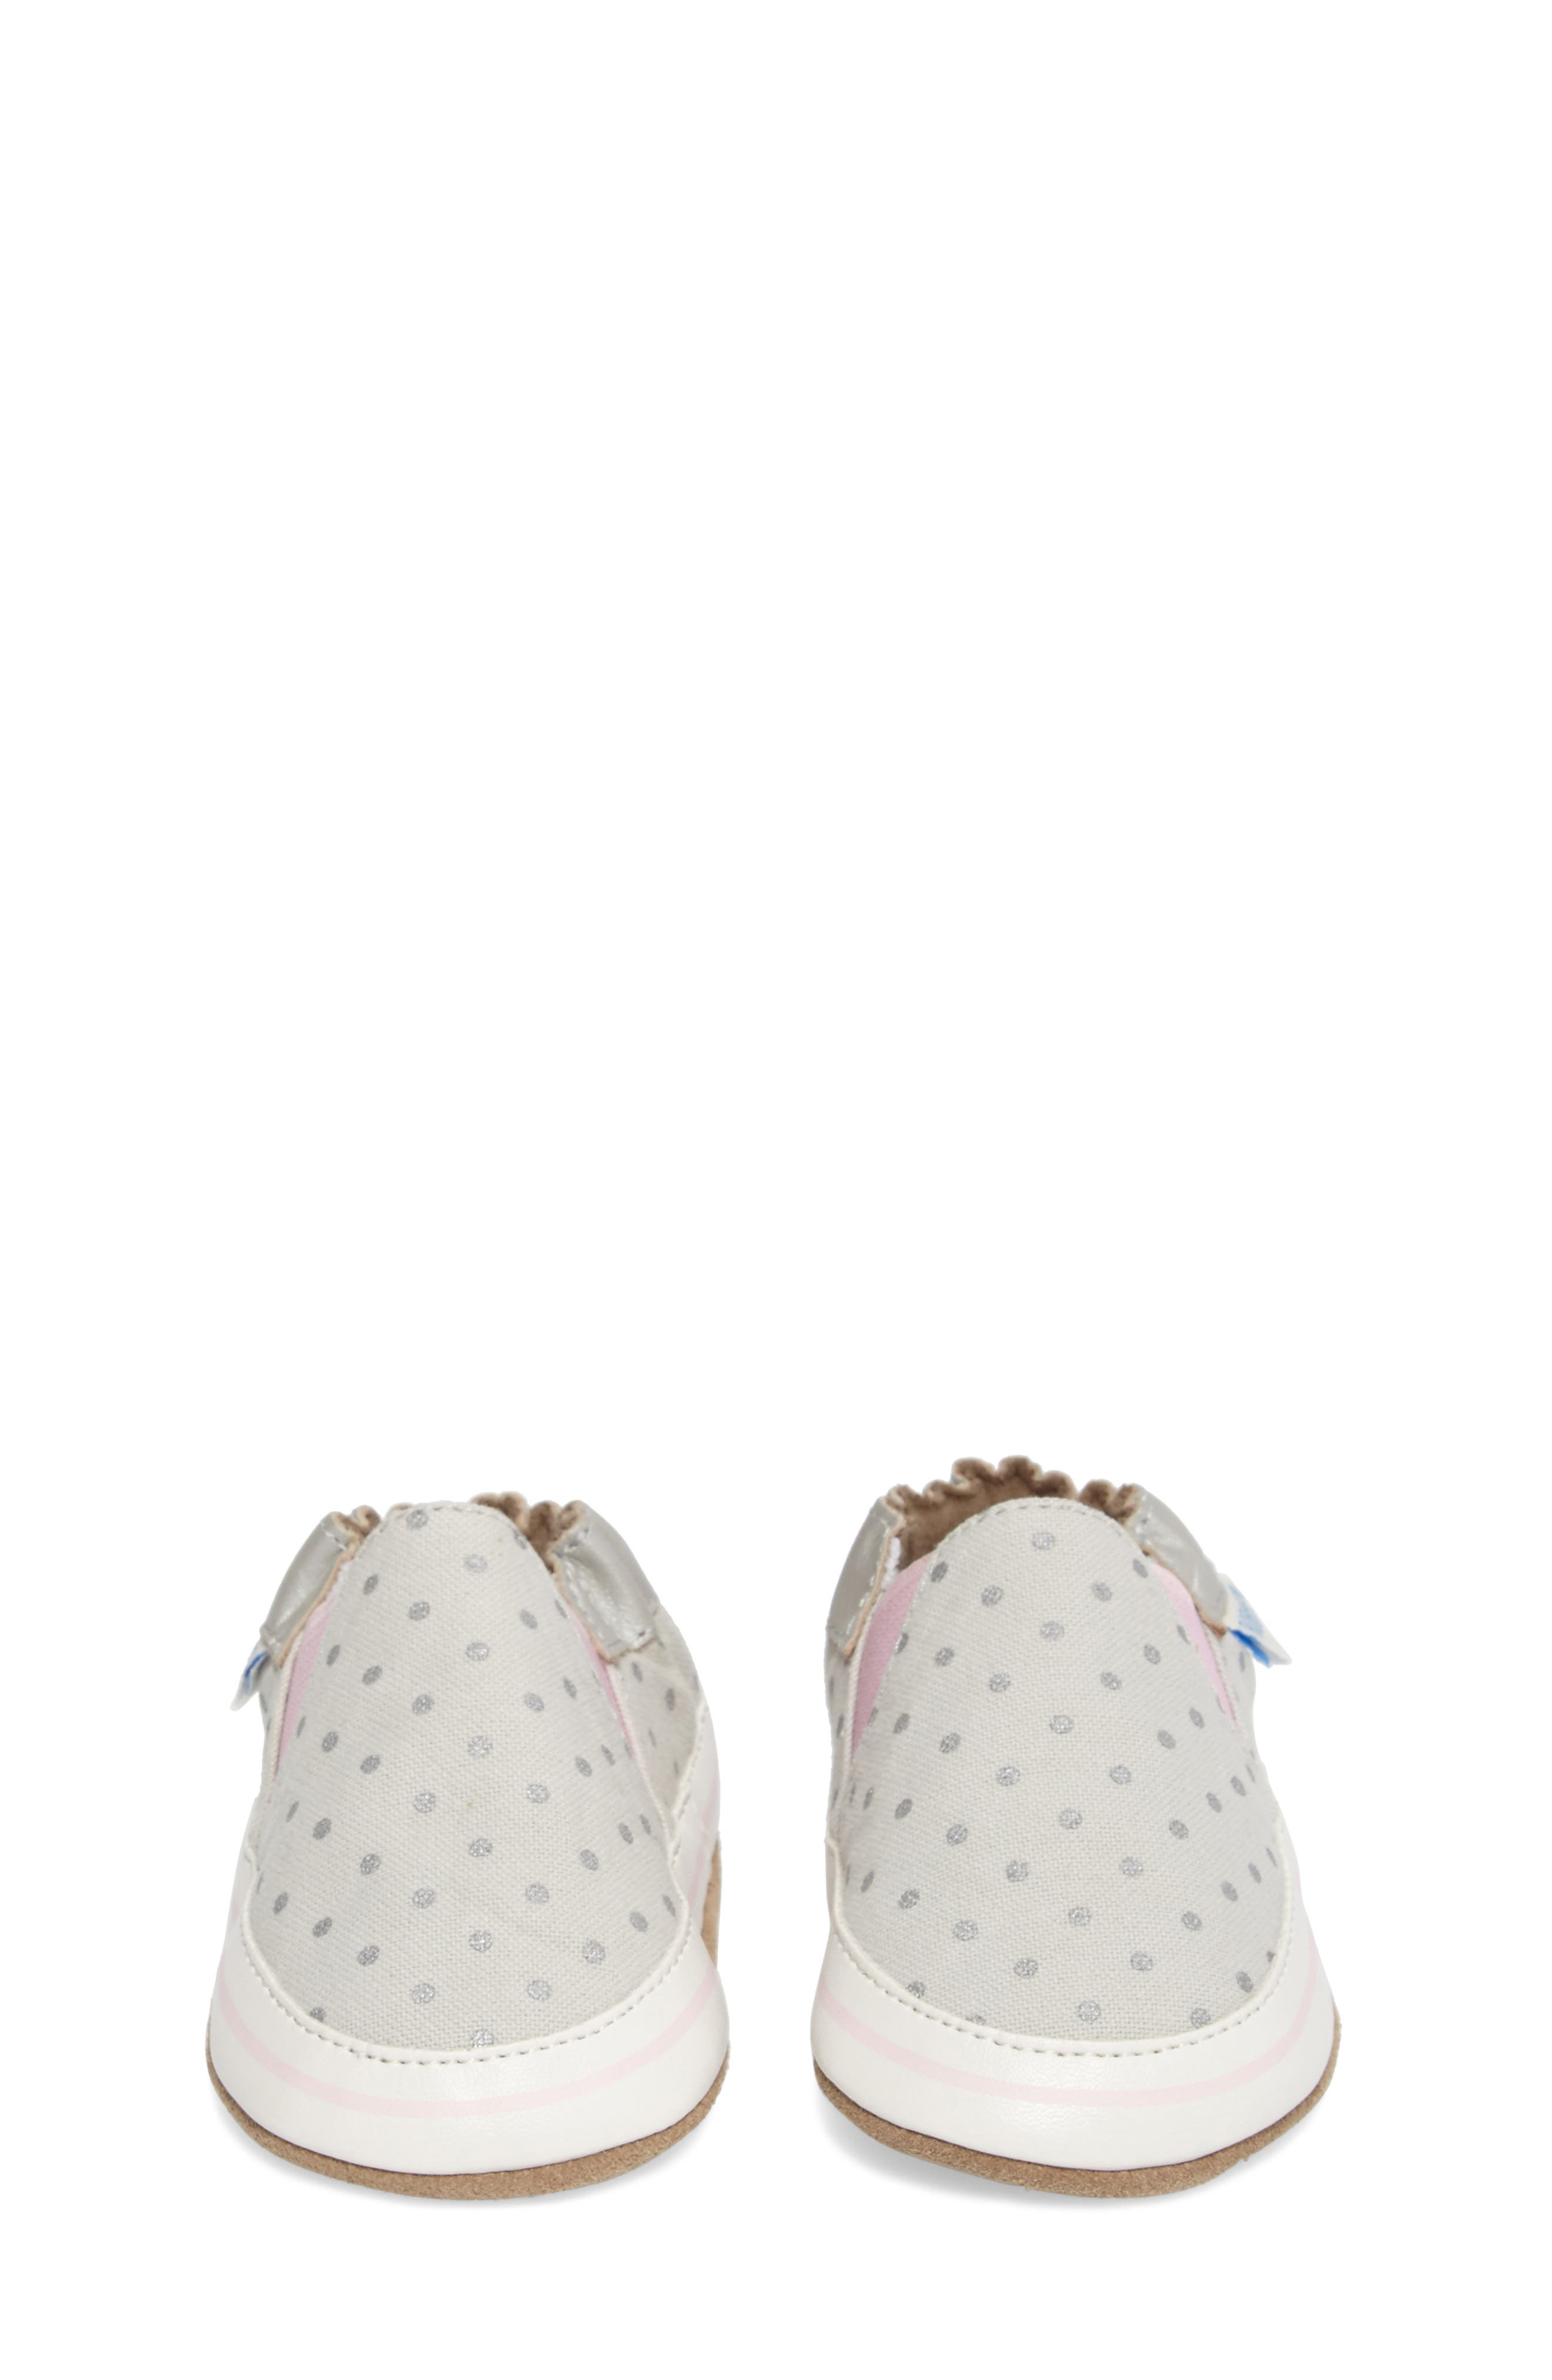 Dot Mania Crib Shoe,                             Alternate thumbnail 4, color,                             METALLIC GREY LEATHER